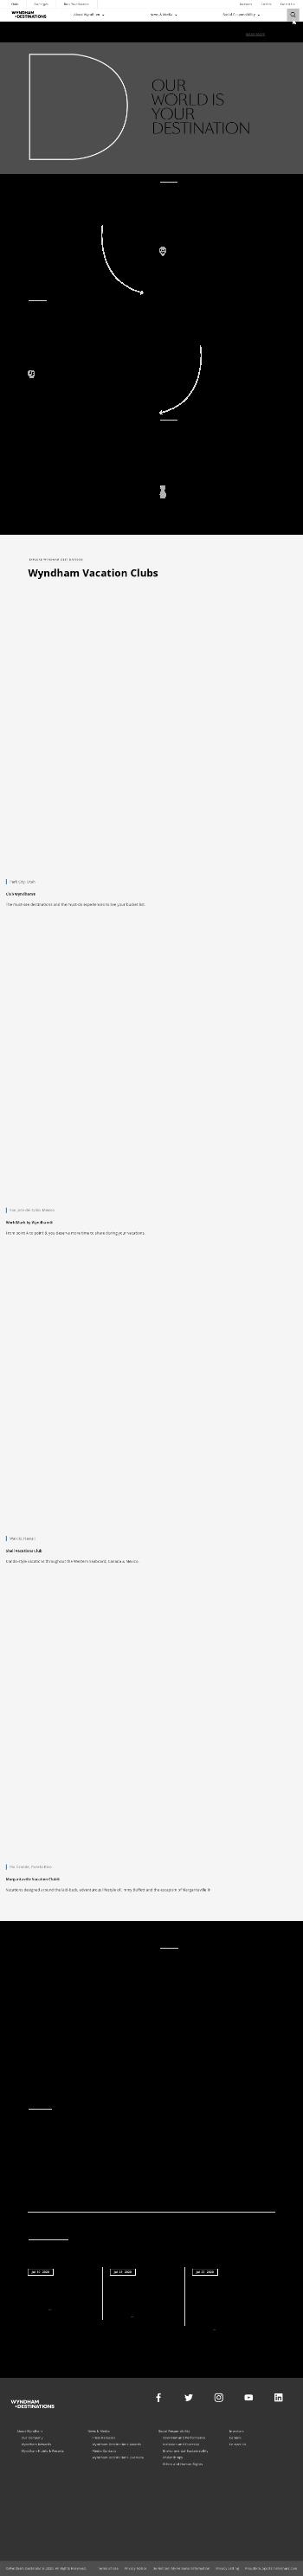 Wyndham Destinations, Inc. Website Screenshot